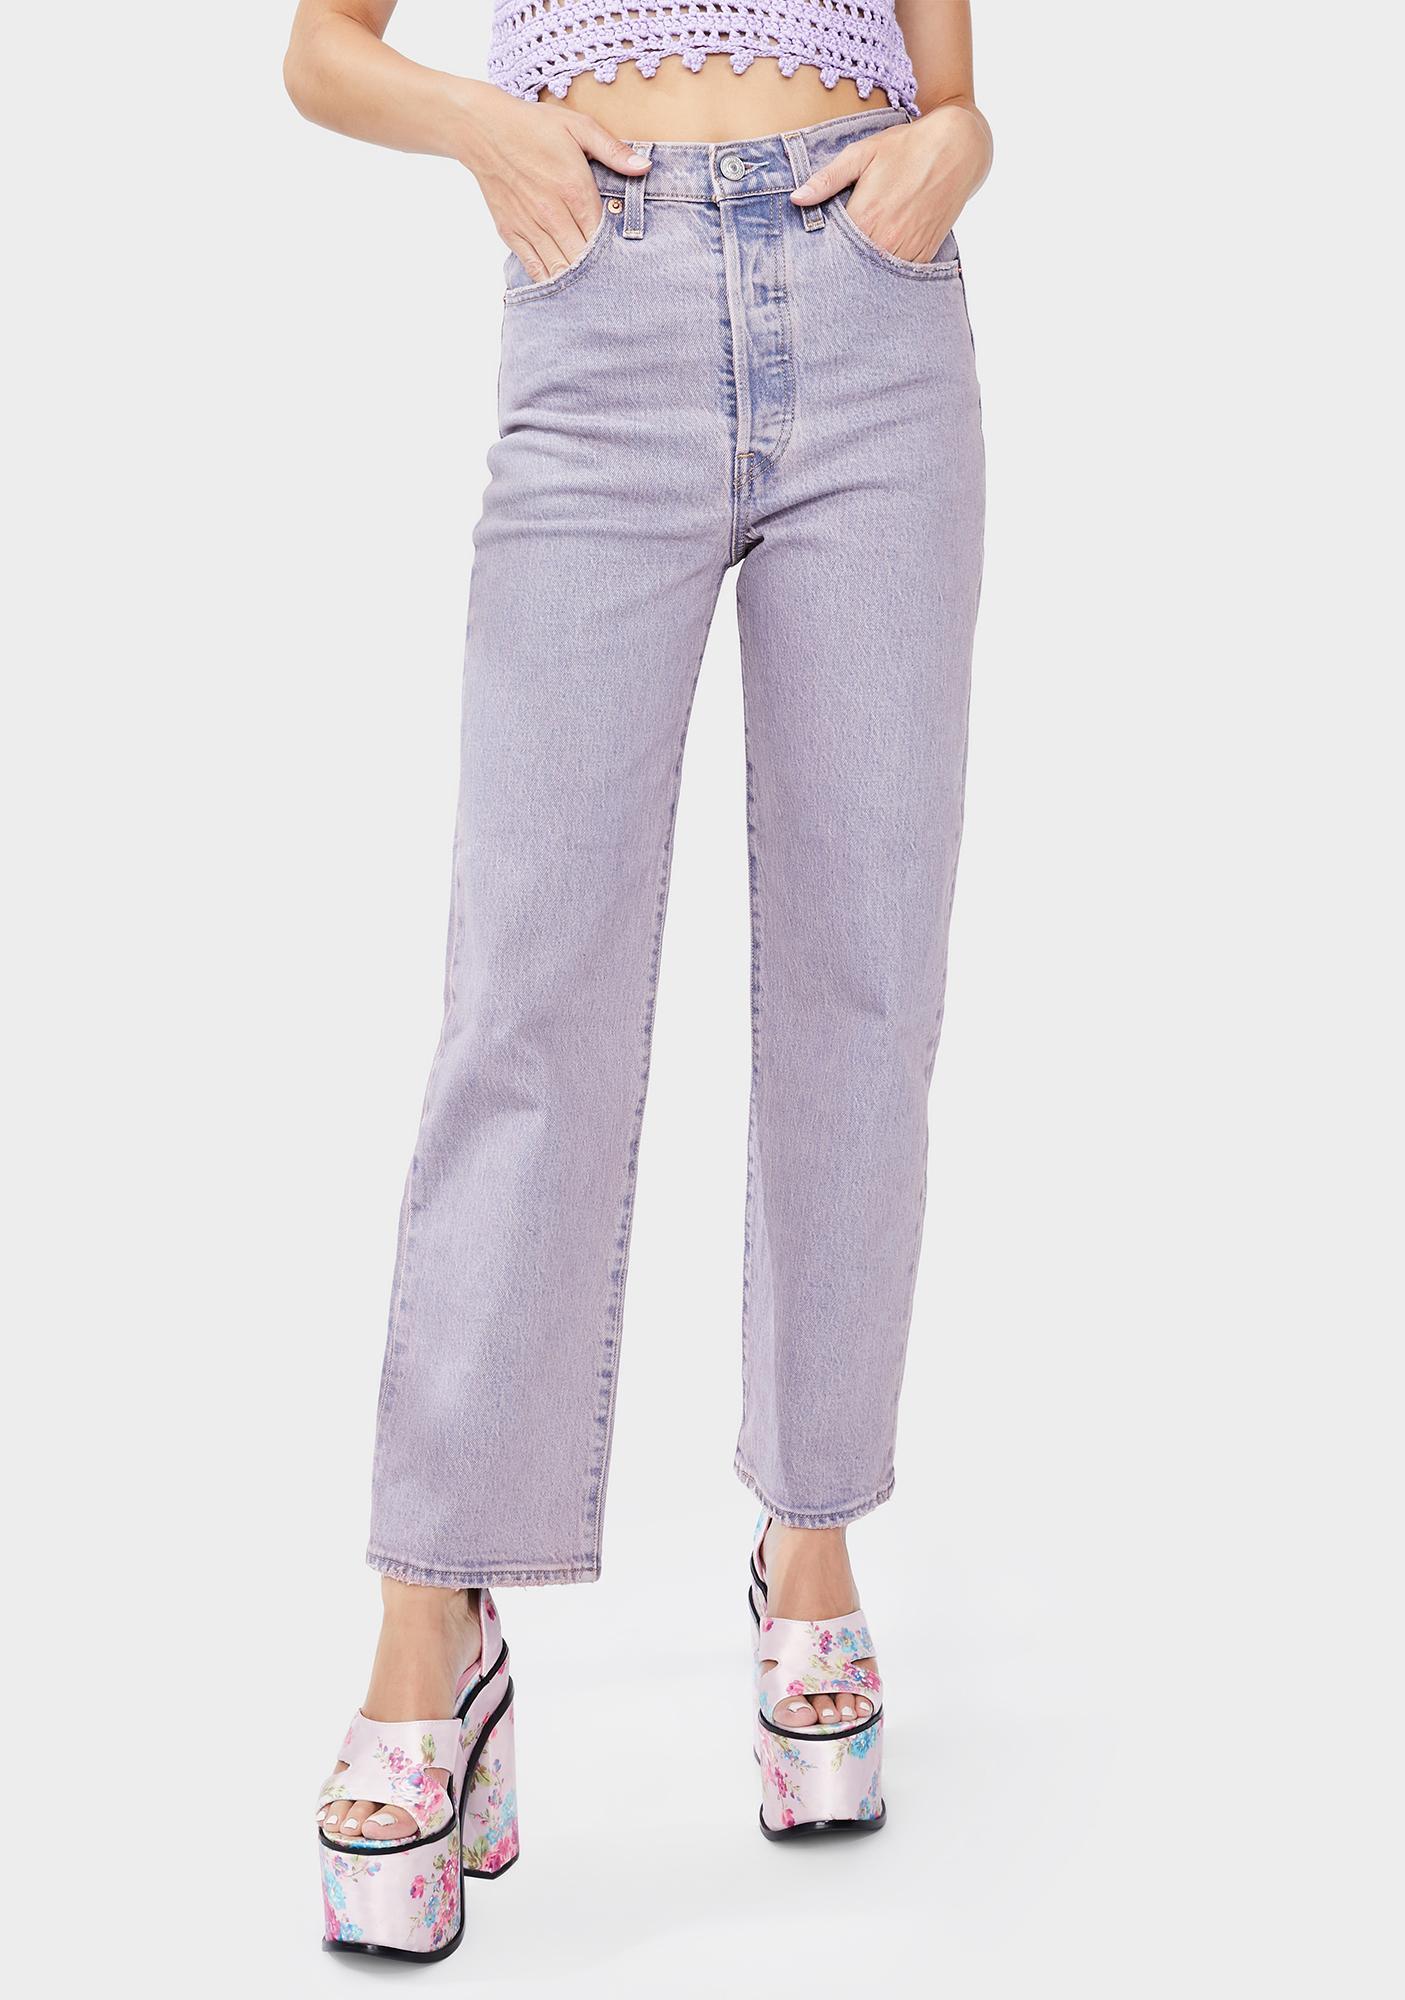 Levis Lavender Tango Ribcage Straight Leg Ankle Jeans